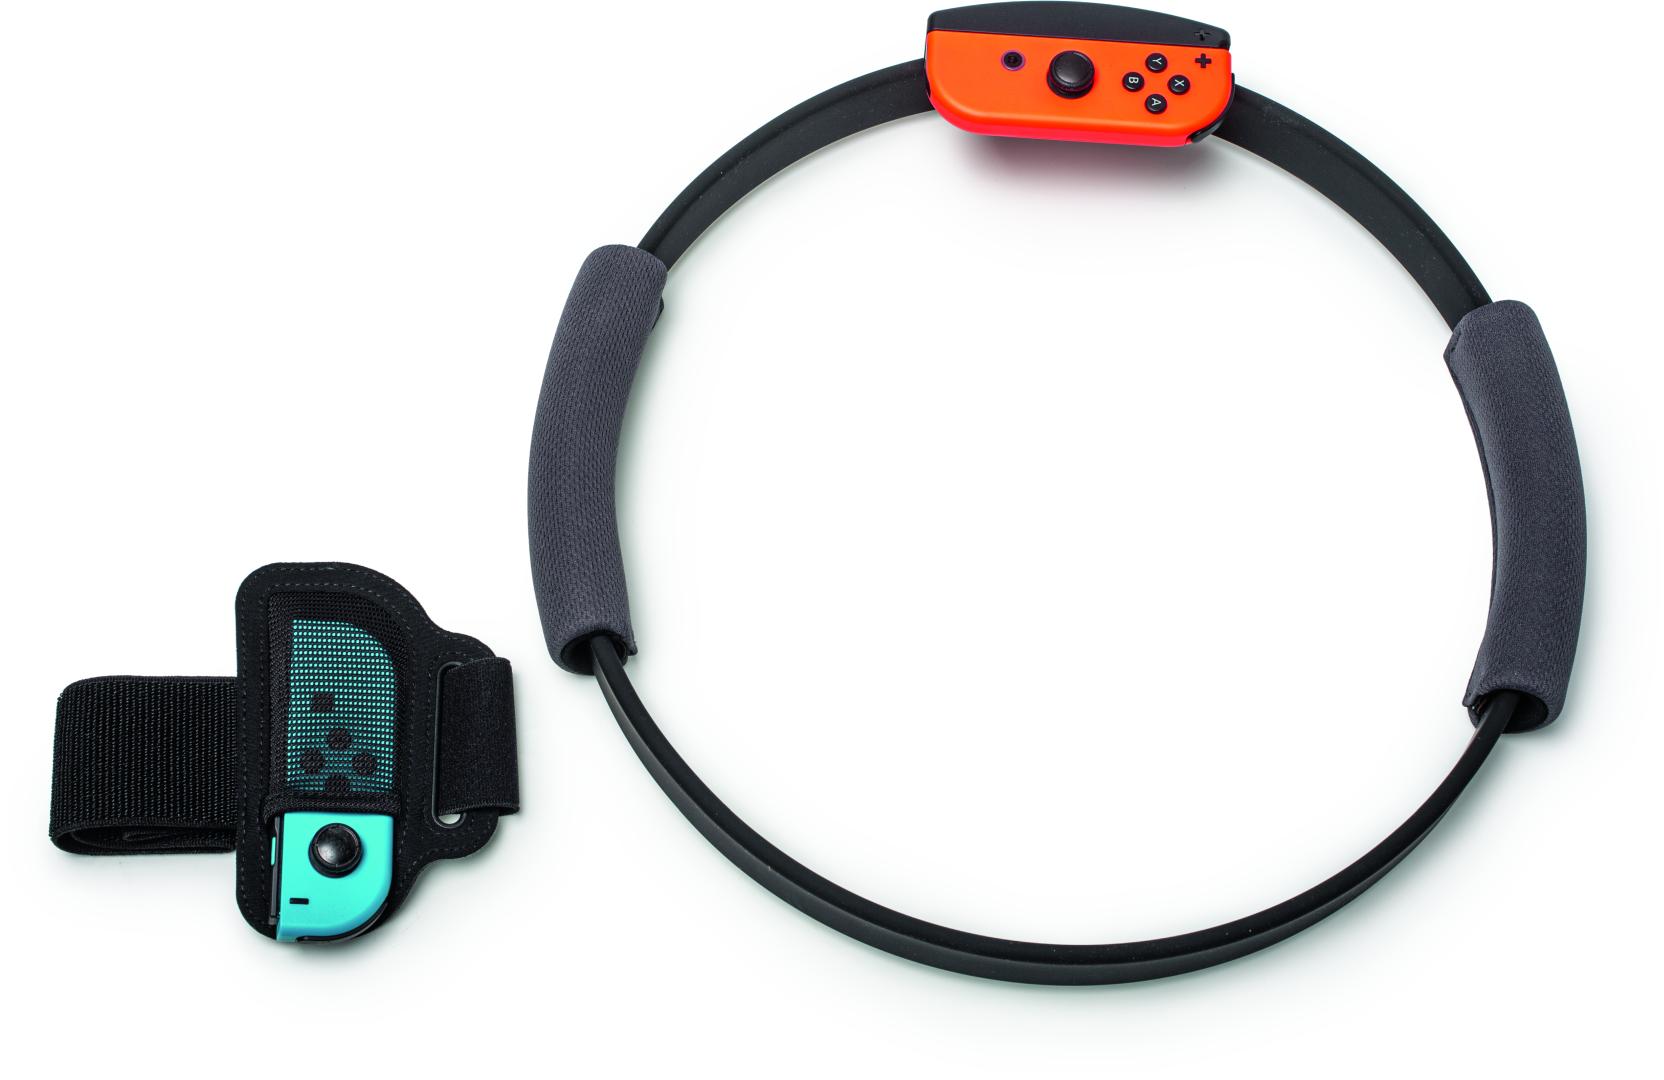 binnen sporten fit blijven Ring Fit Adventure review Nintendo Switch ring con joy con been